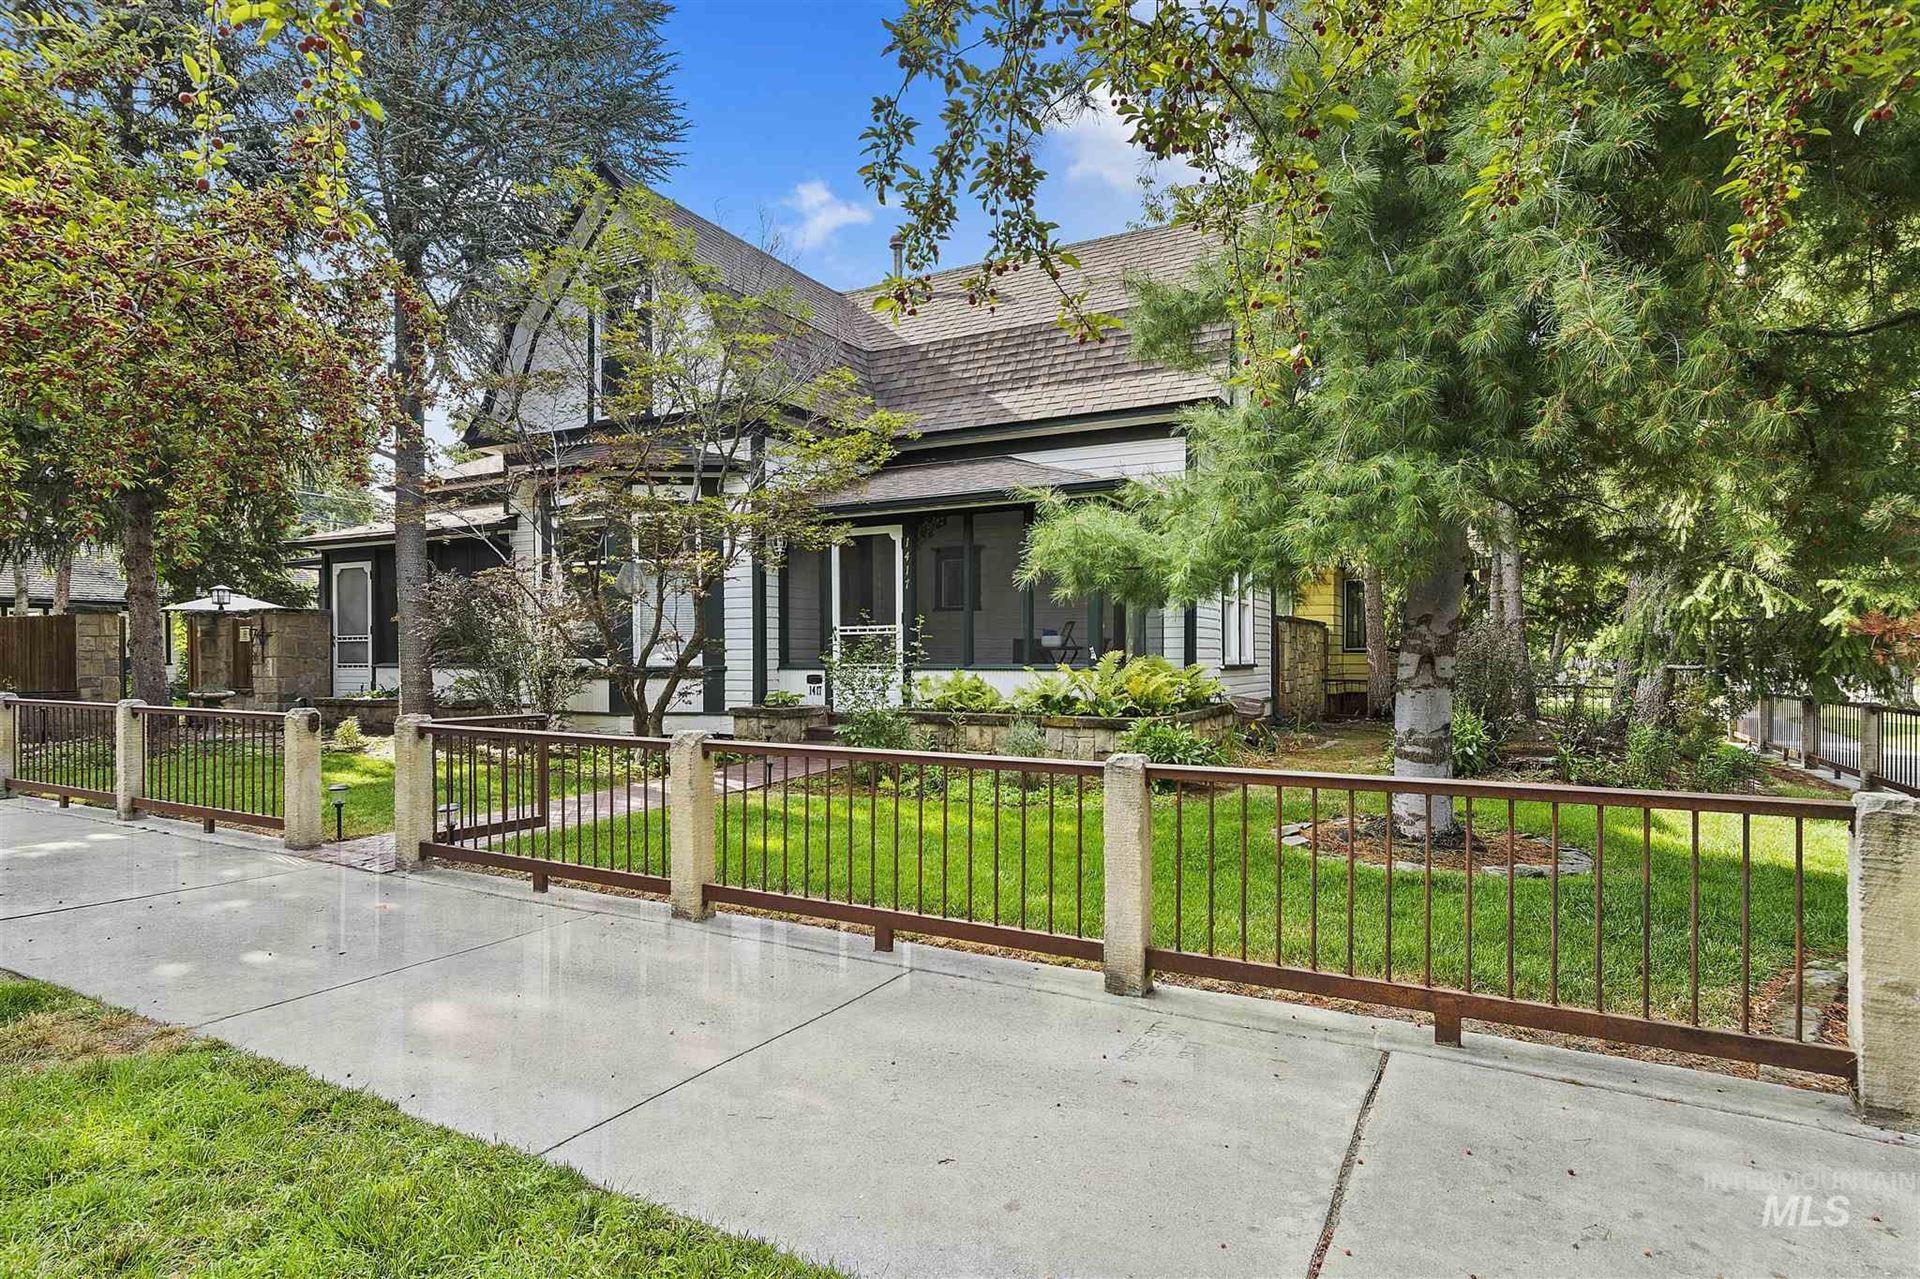 1417 Ridenbaugh St, Boise, ID 83702 - MLS#: 98777662